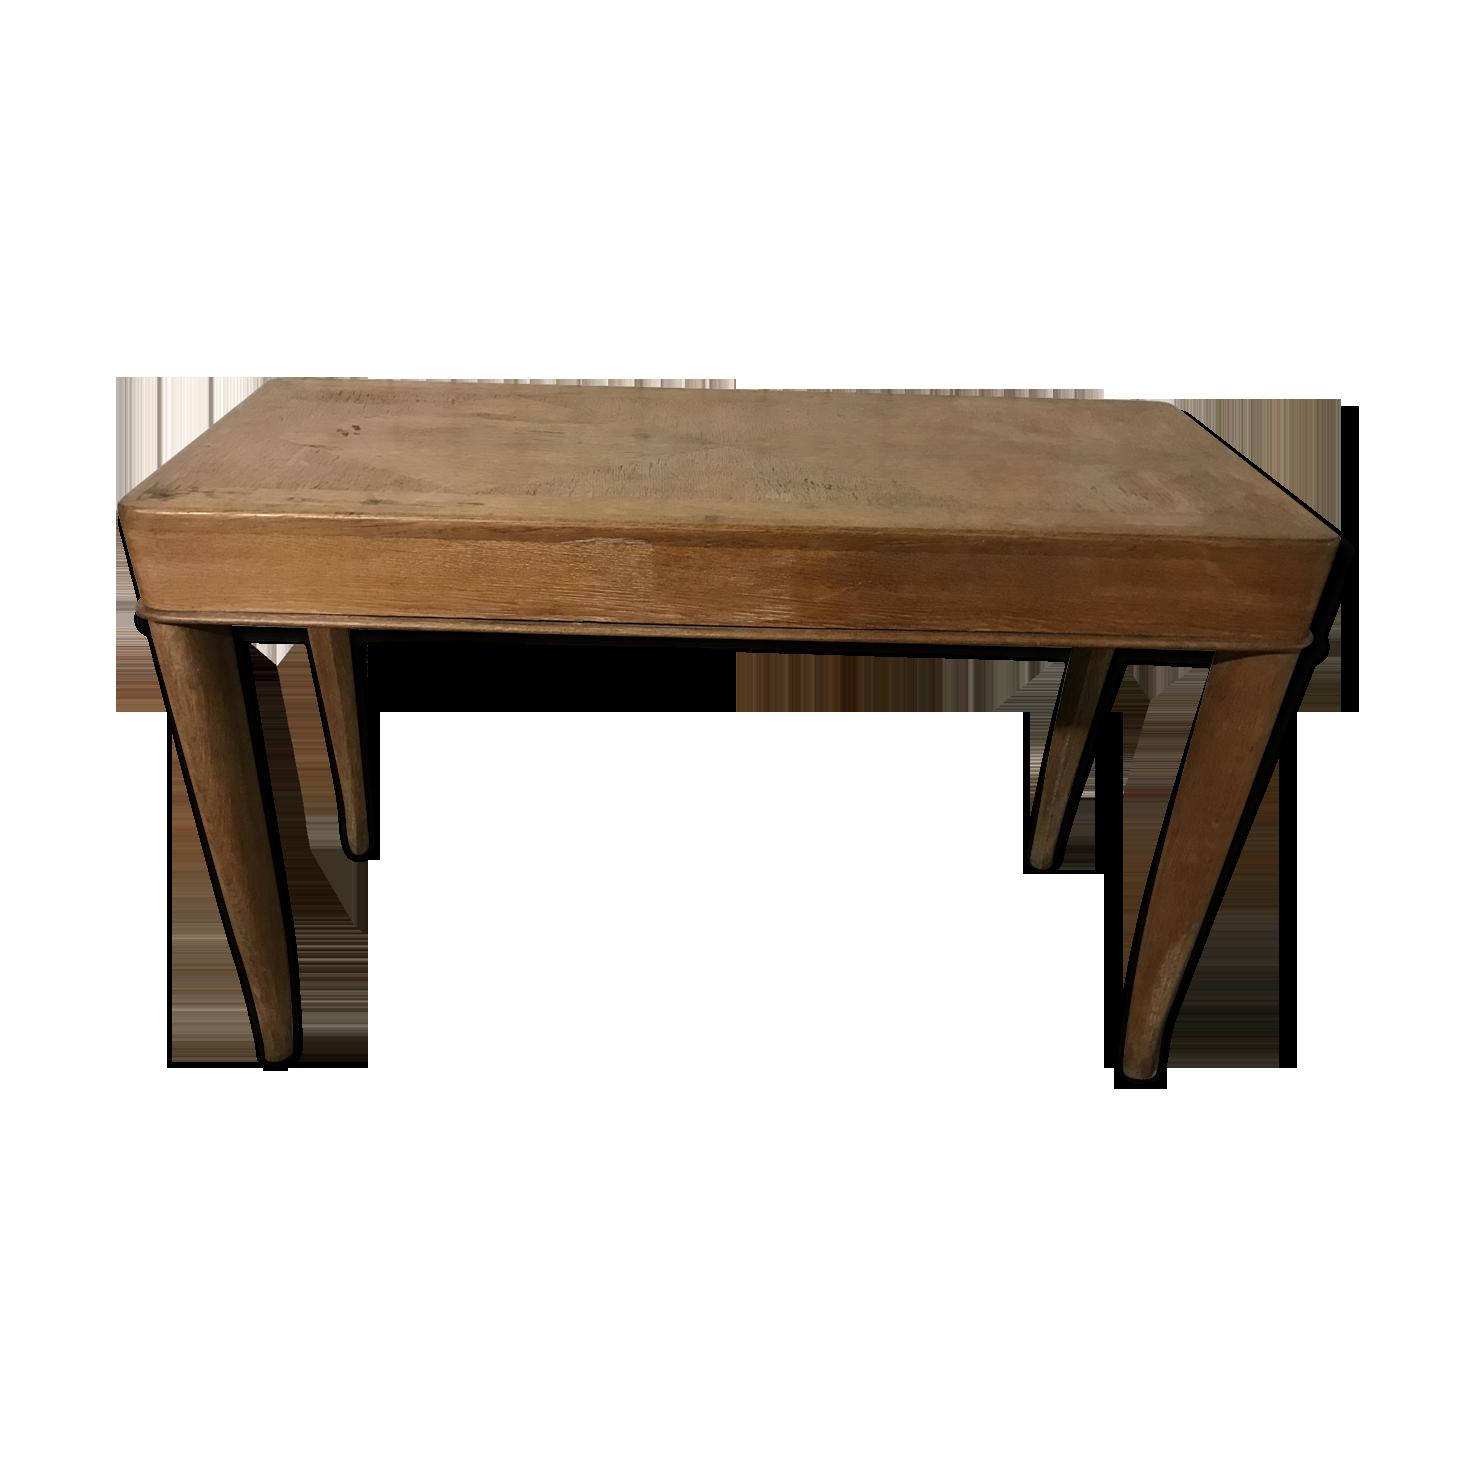 L*W*H Marron Console /à 2/tiroirs en ch/êne Massif Dimensions : 83 x 30 x 73 cm